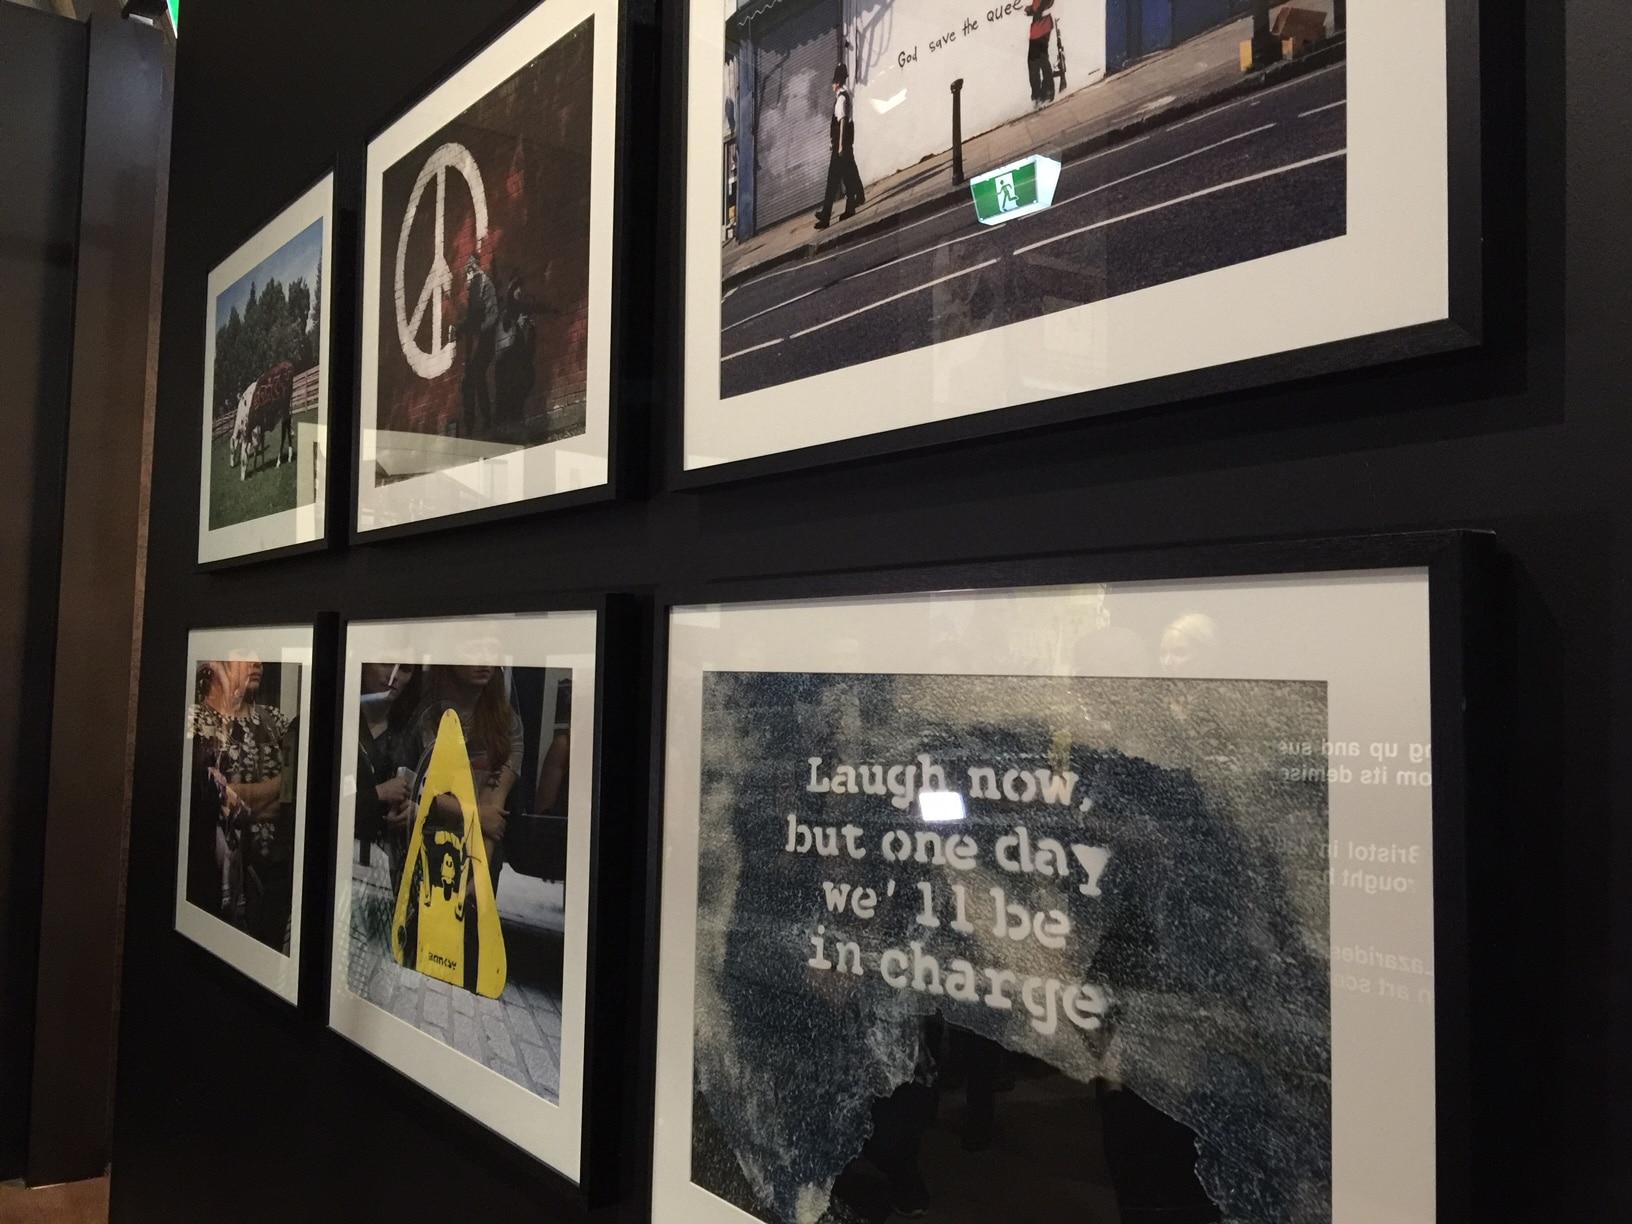 D Exhibition Melbourne : Melbourne banksy exhibition missing artist s approval